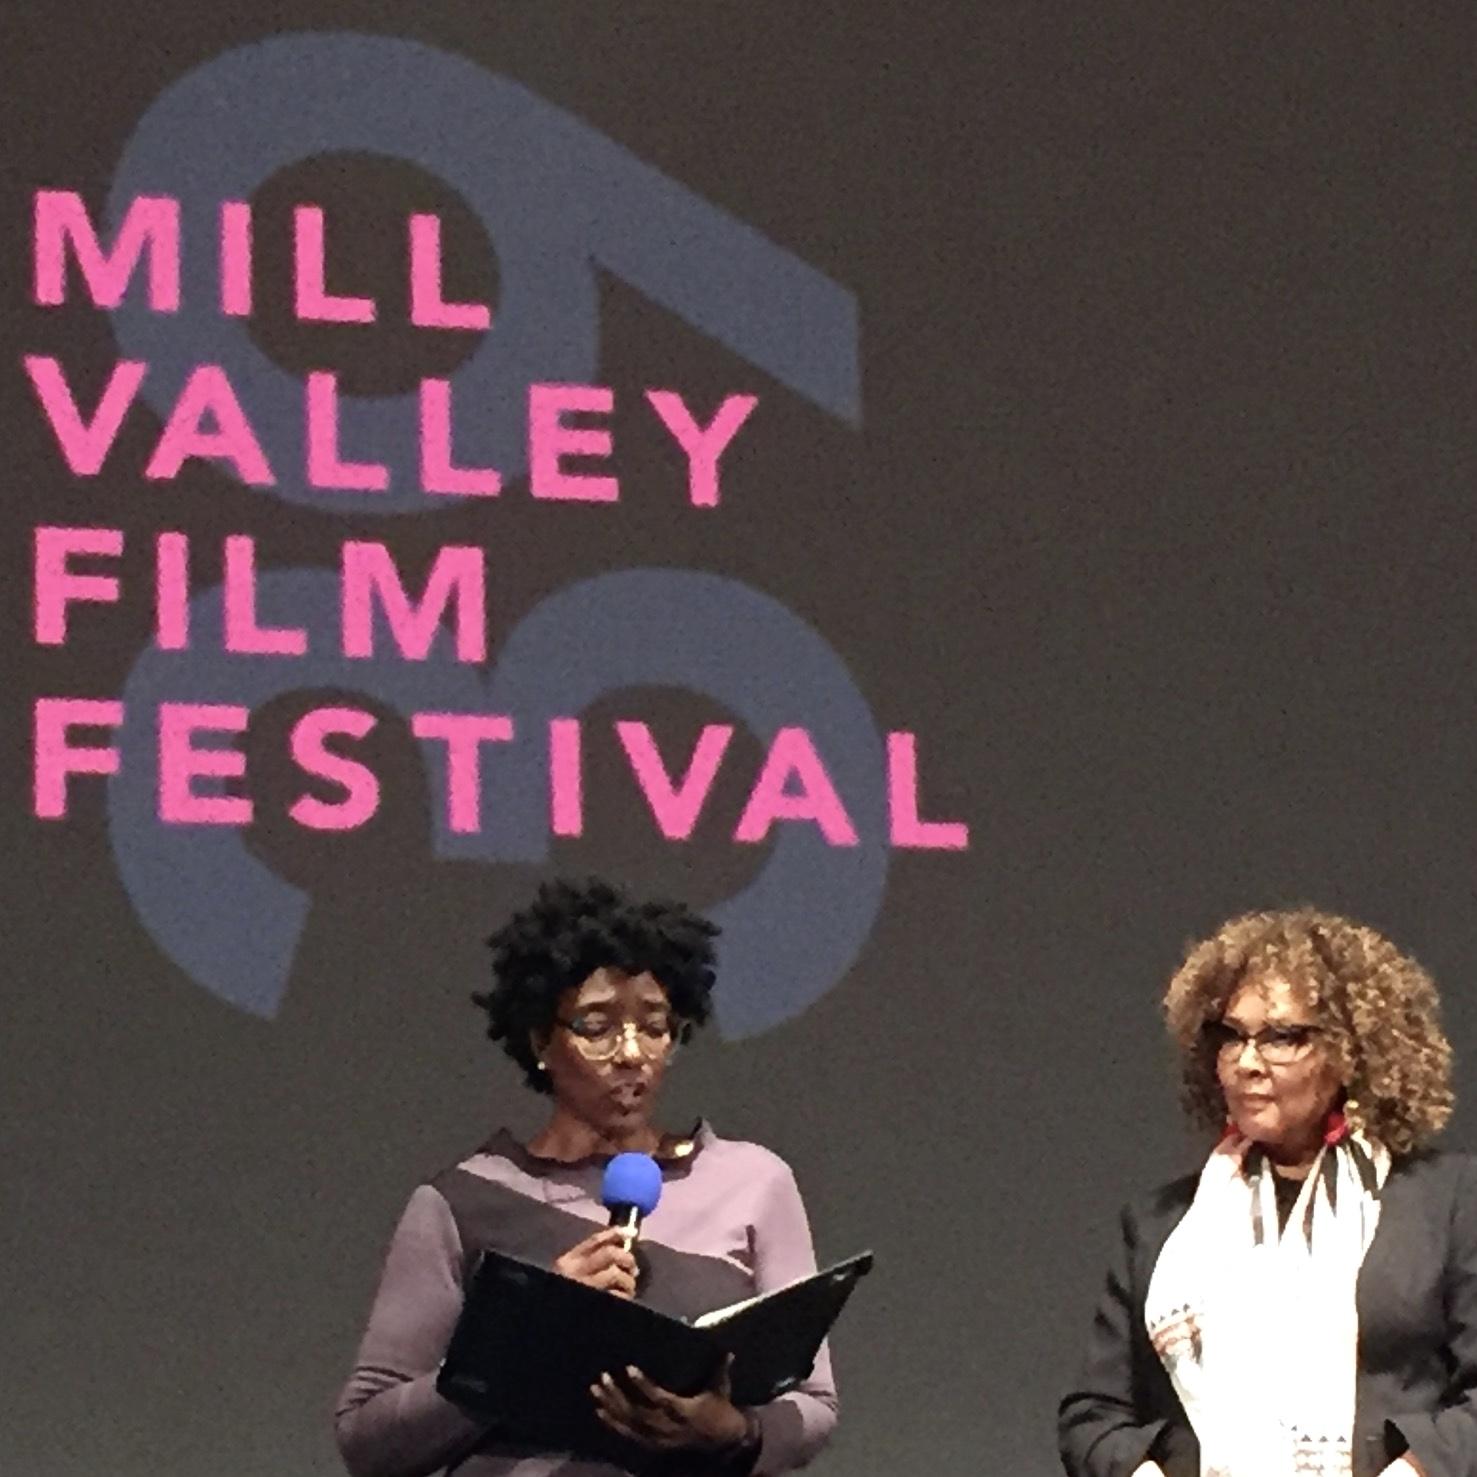 September Williams presents the MVFF award to Julie Dash